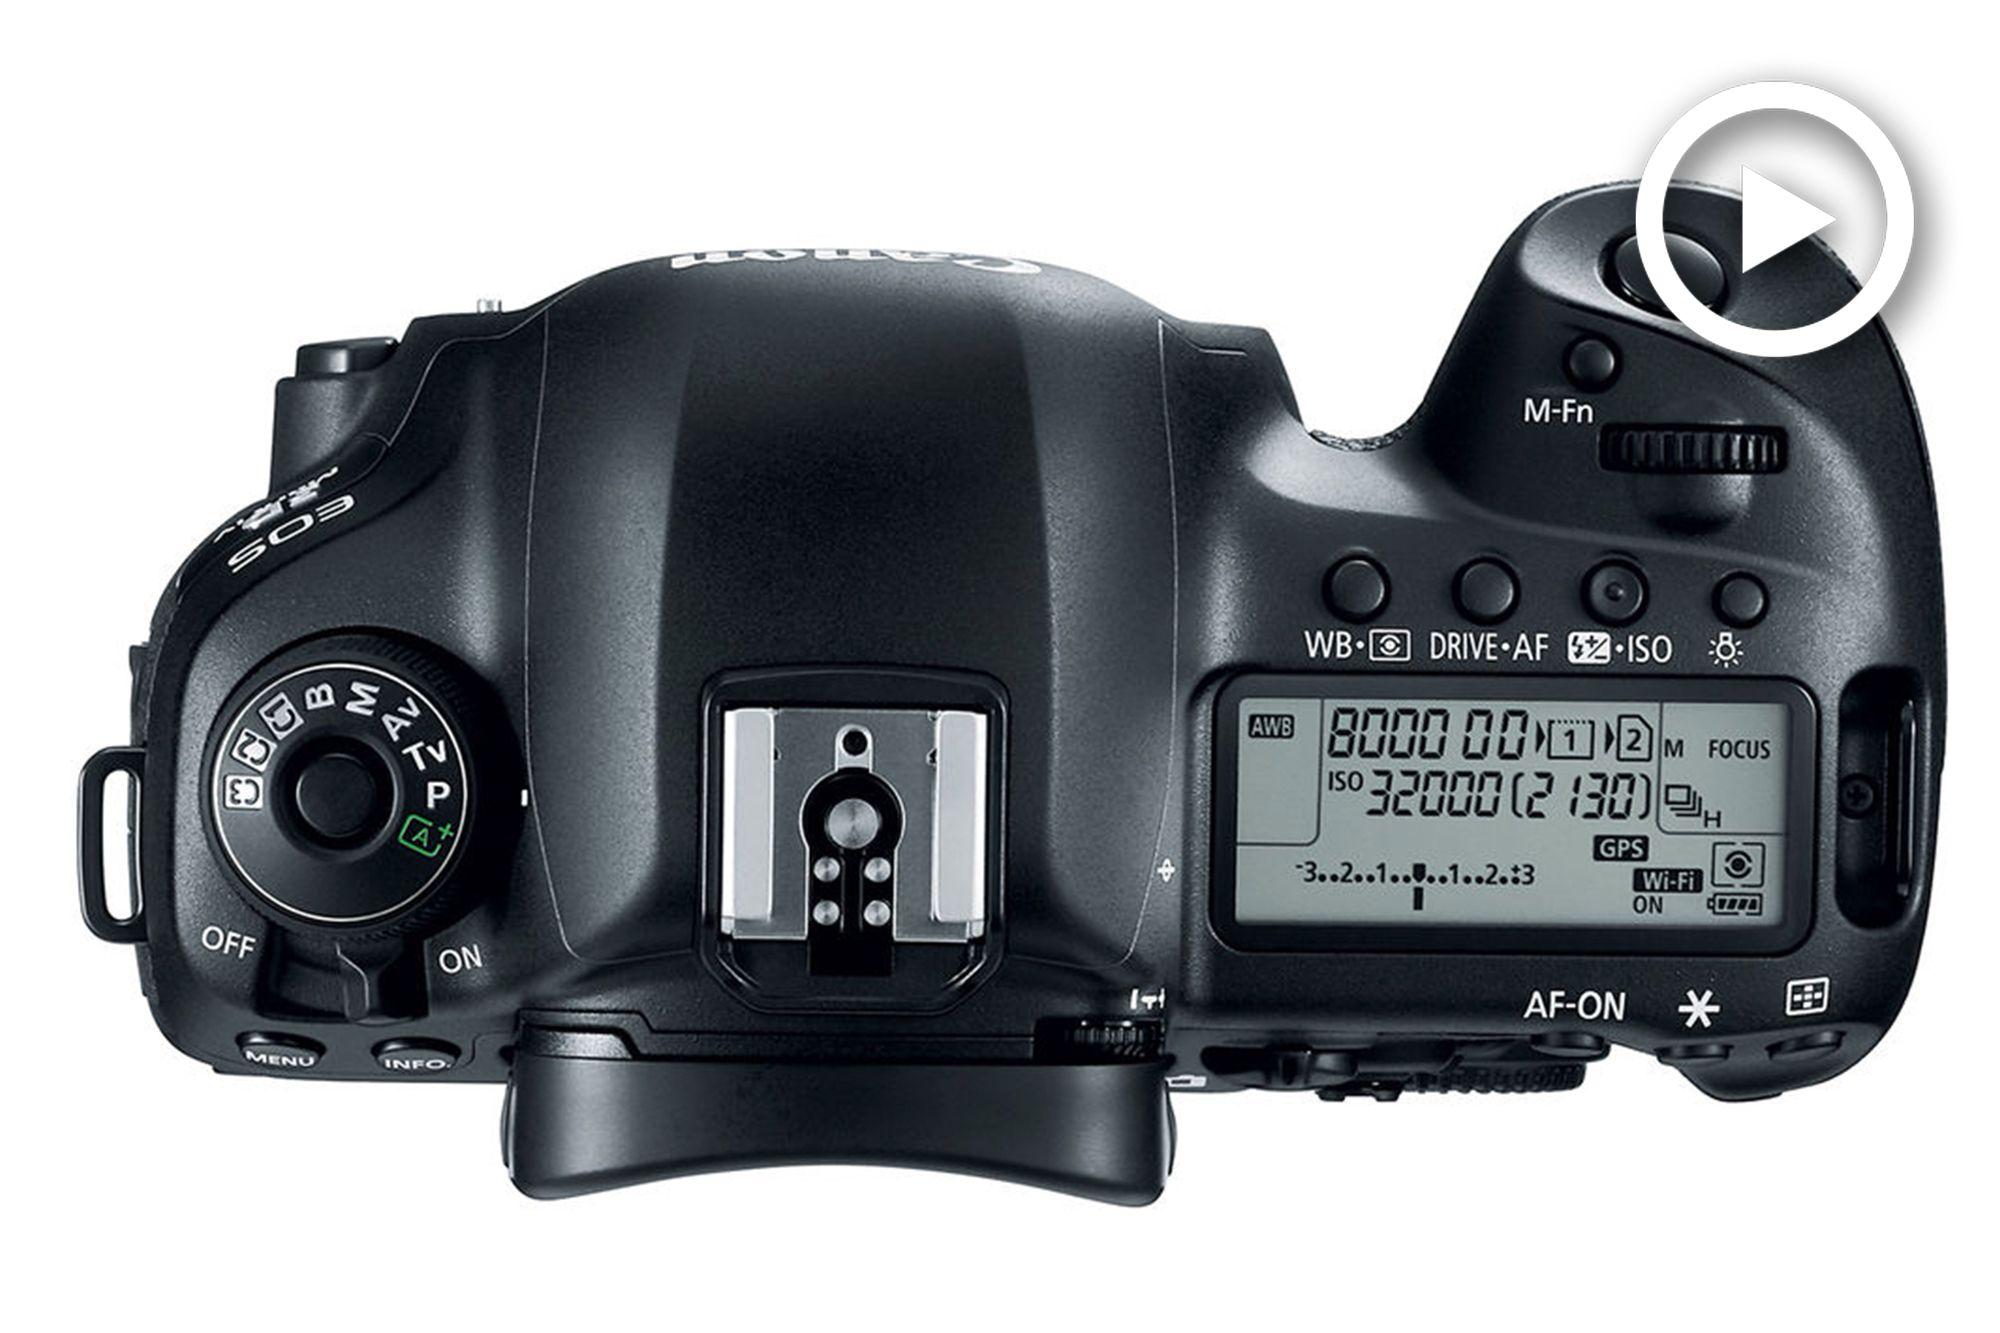 Aperture Priority Shutter Priority Vs Manual Exposure Canon